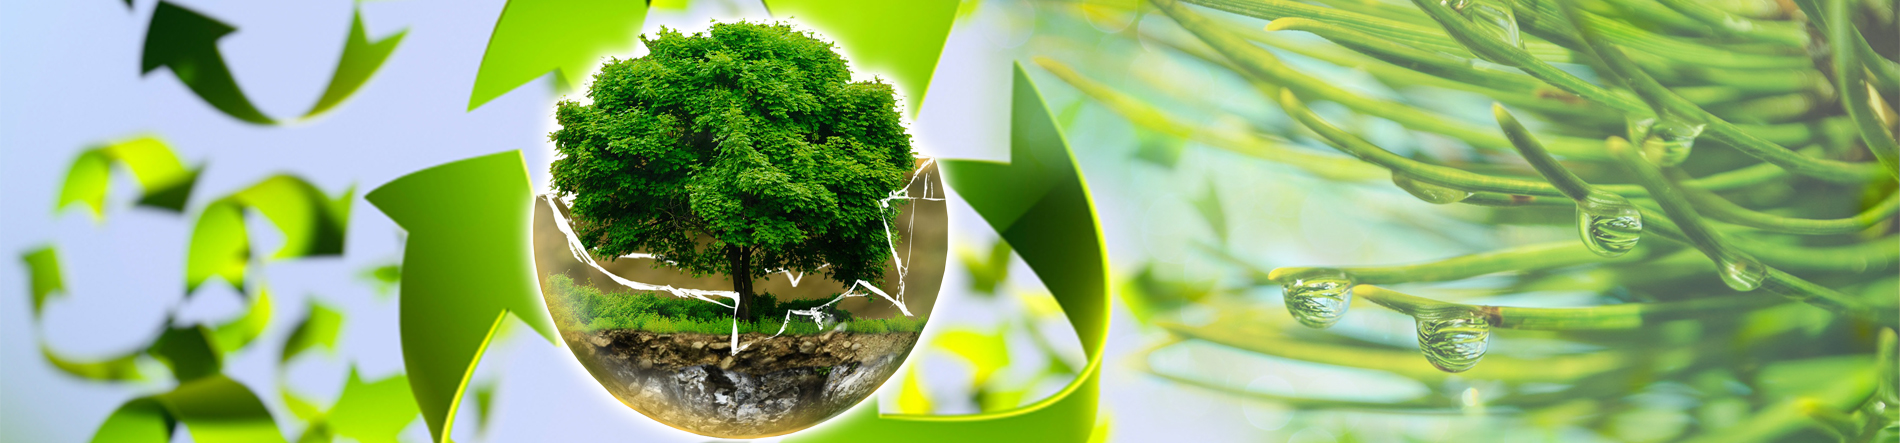 Trasporto rifiuti industriali e agricoli - trasporti rifiuti organici